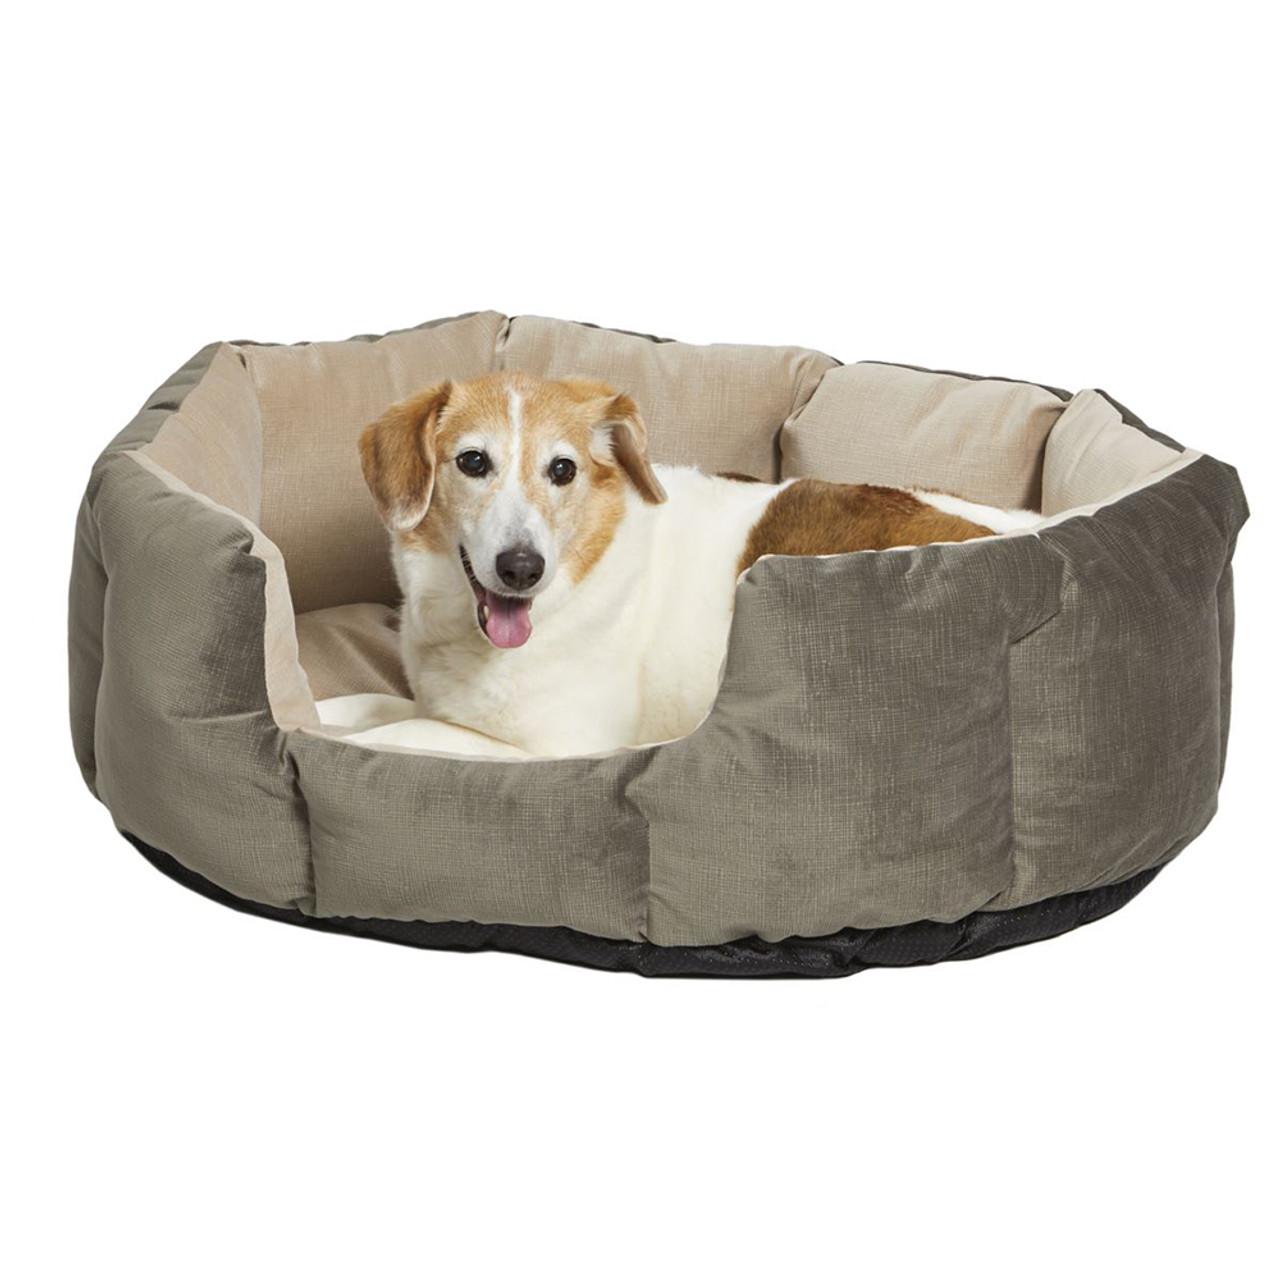 MidWest QuietTime Deluxe Evergreen Tulip Pet Bed